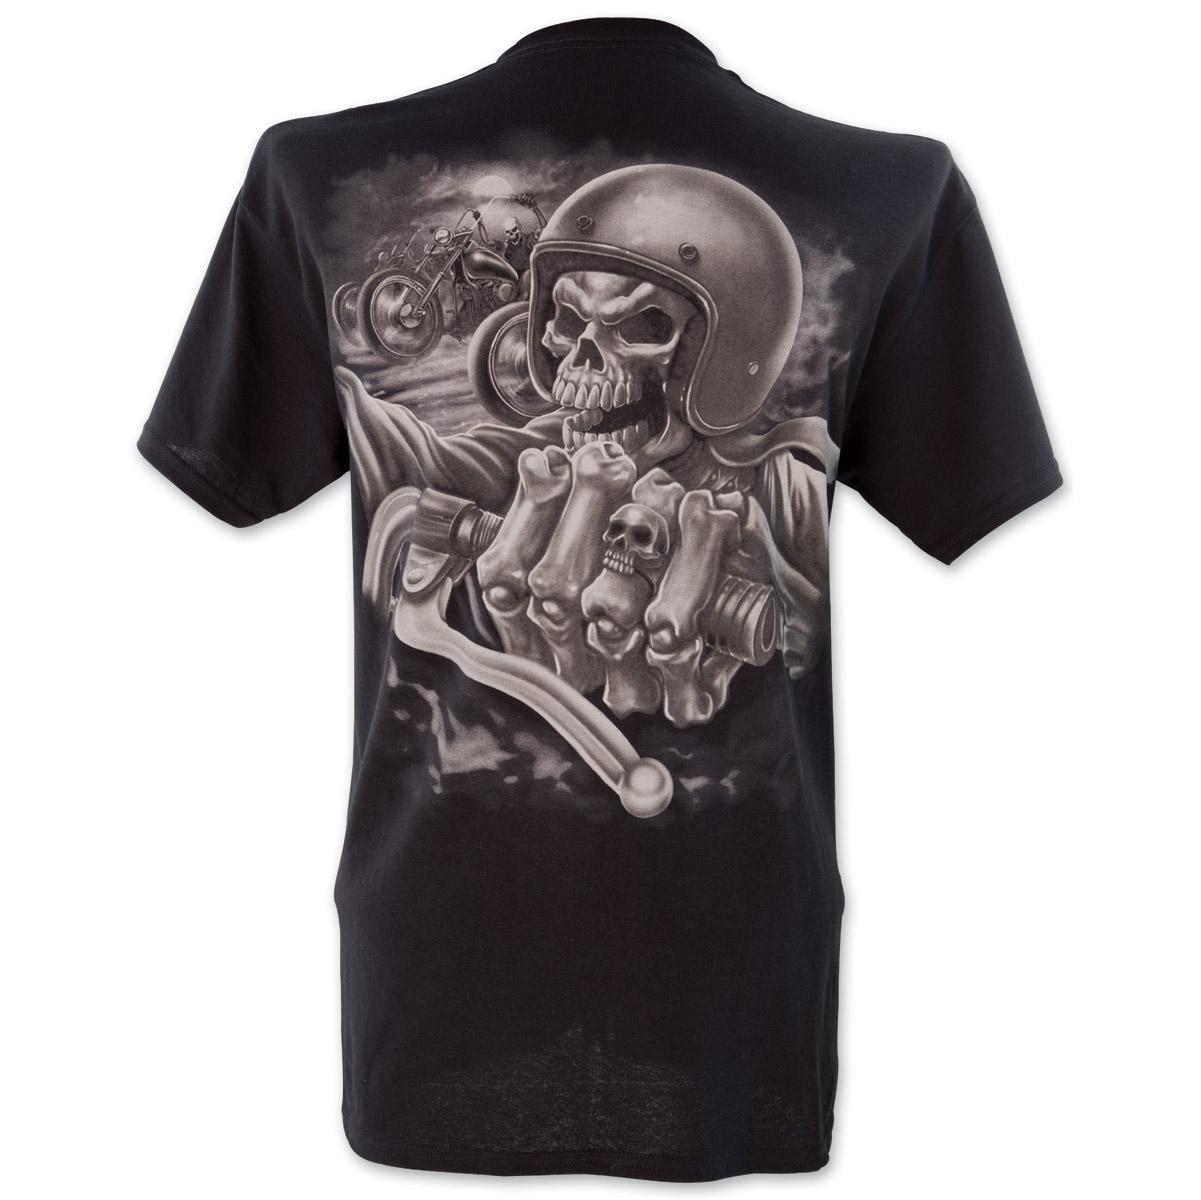 Lethal Threat Skull Crew Black T-Shirt